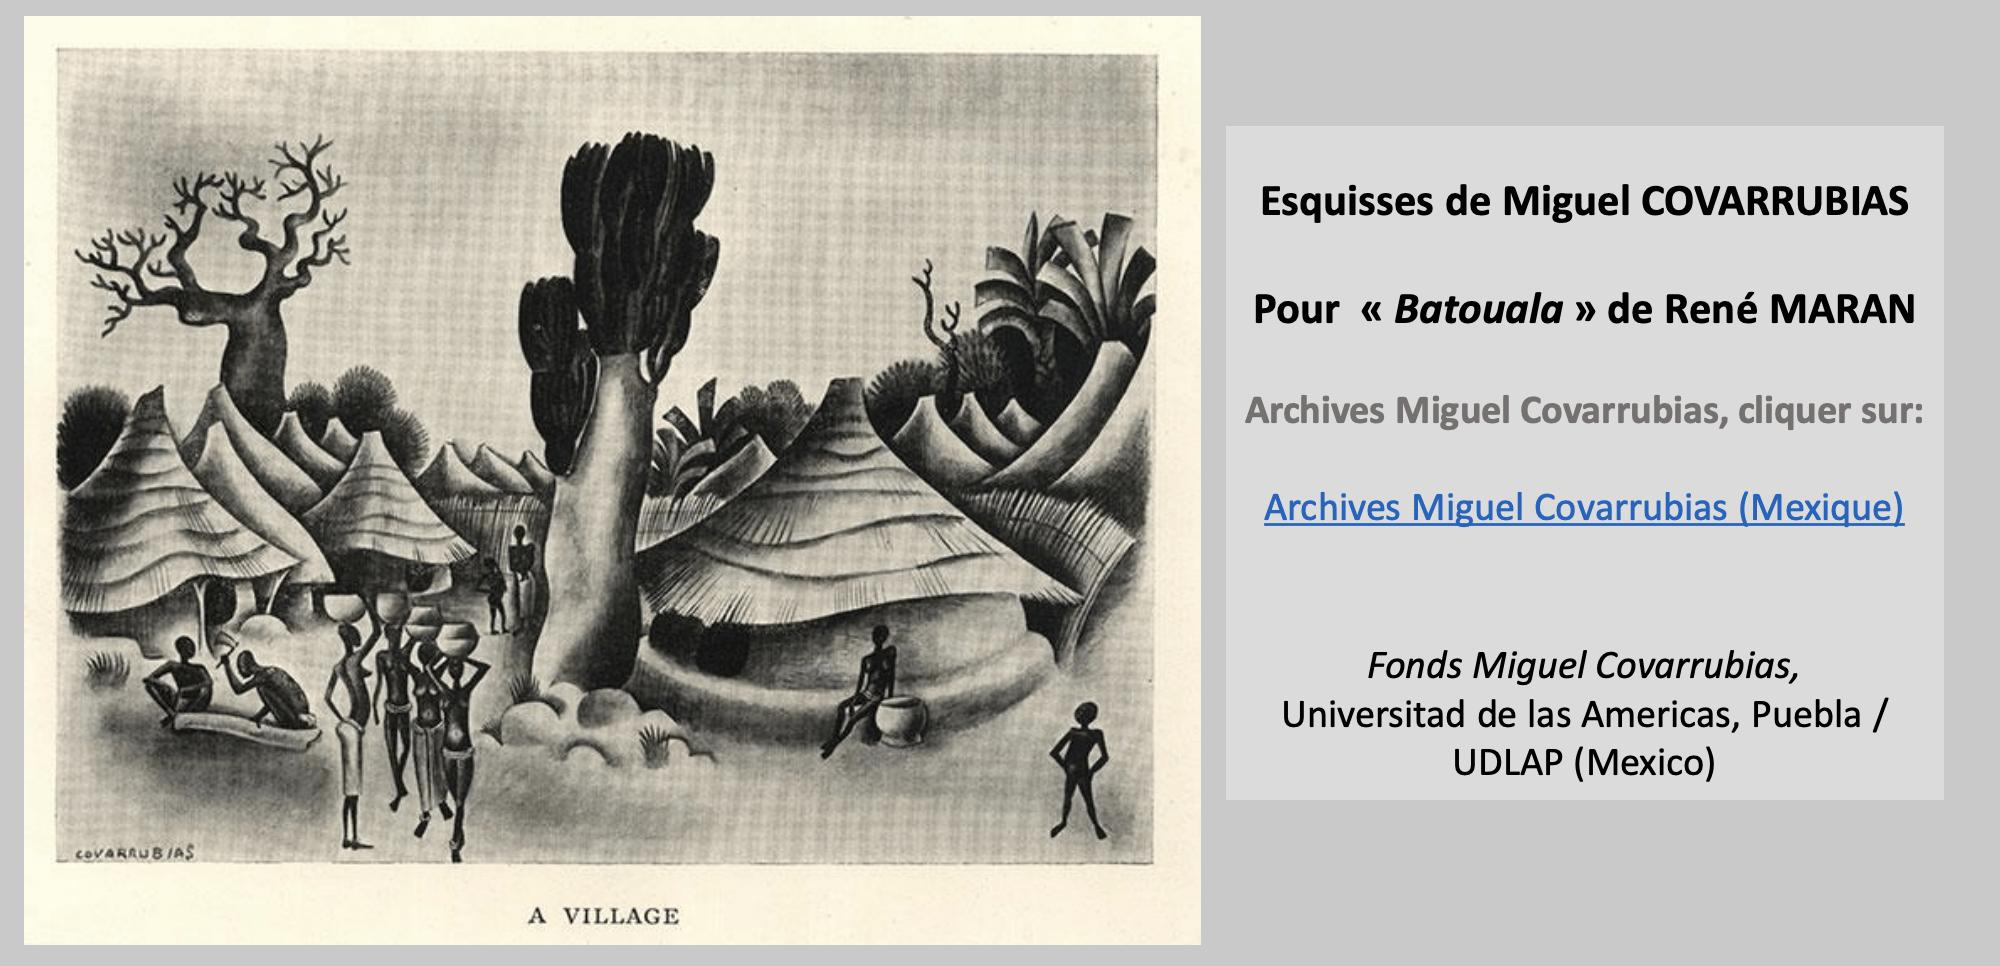 Esquisses De Miguel COVARRUBIAS1, René Maran